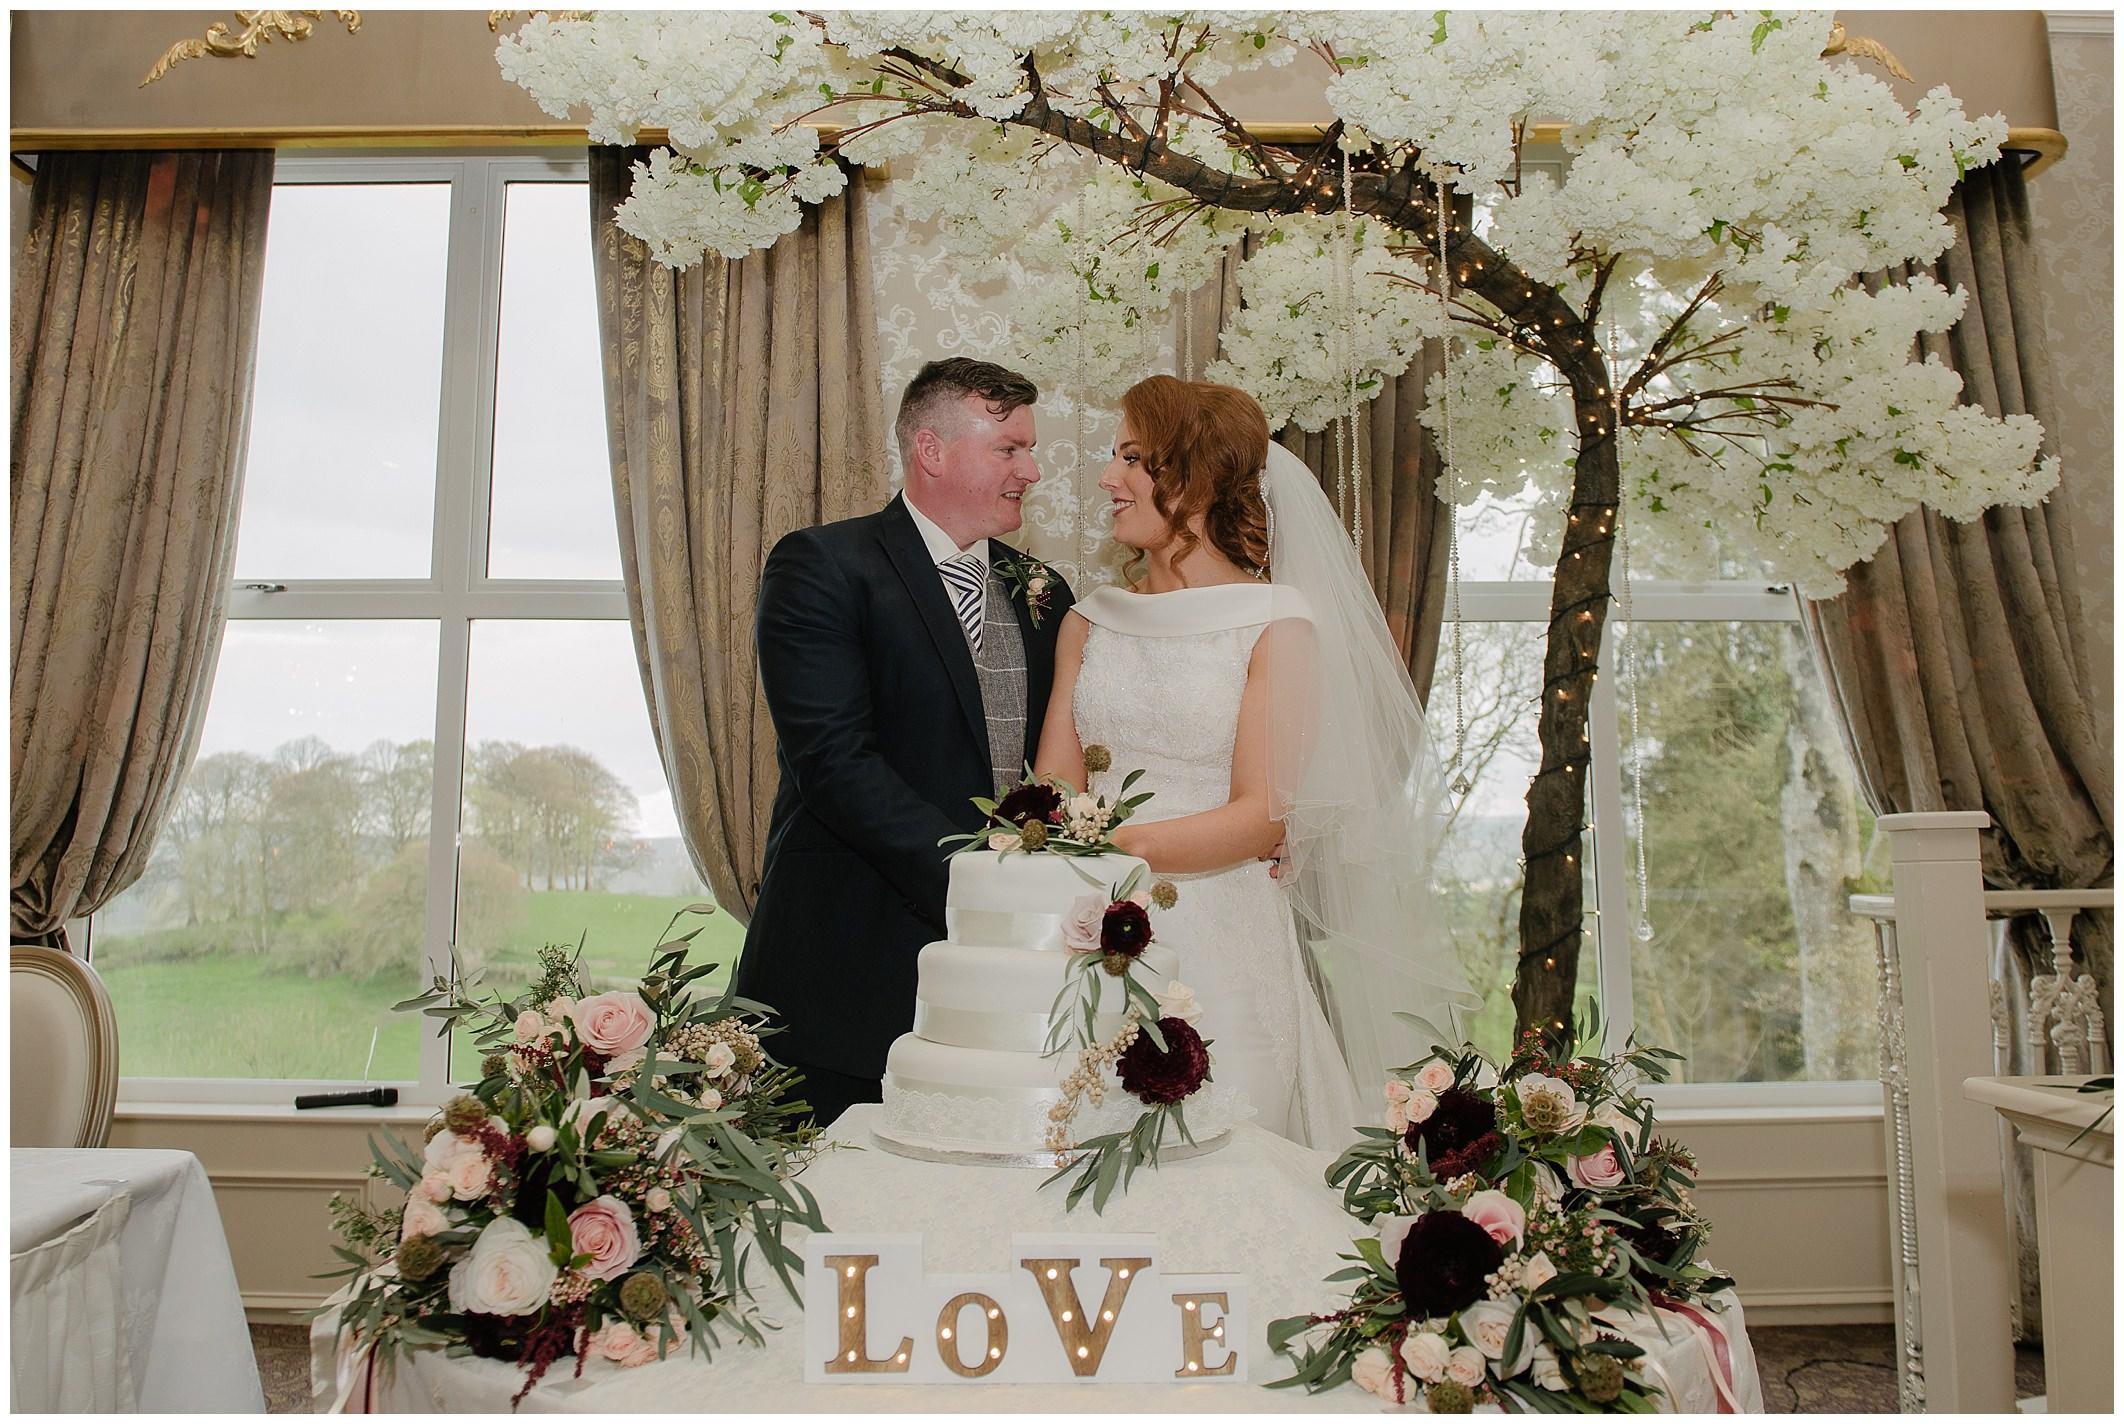 corick-house-wedding-hannah-gary-jude-browne-photography_0088.jpg